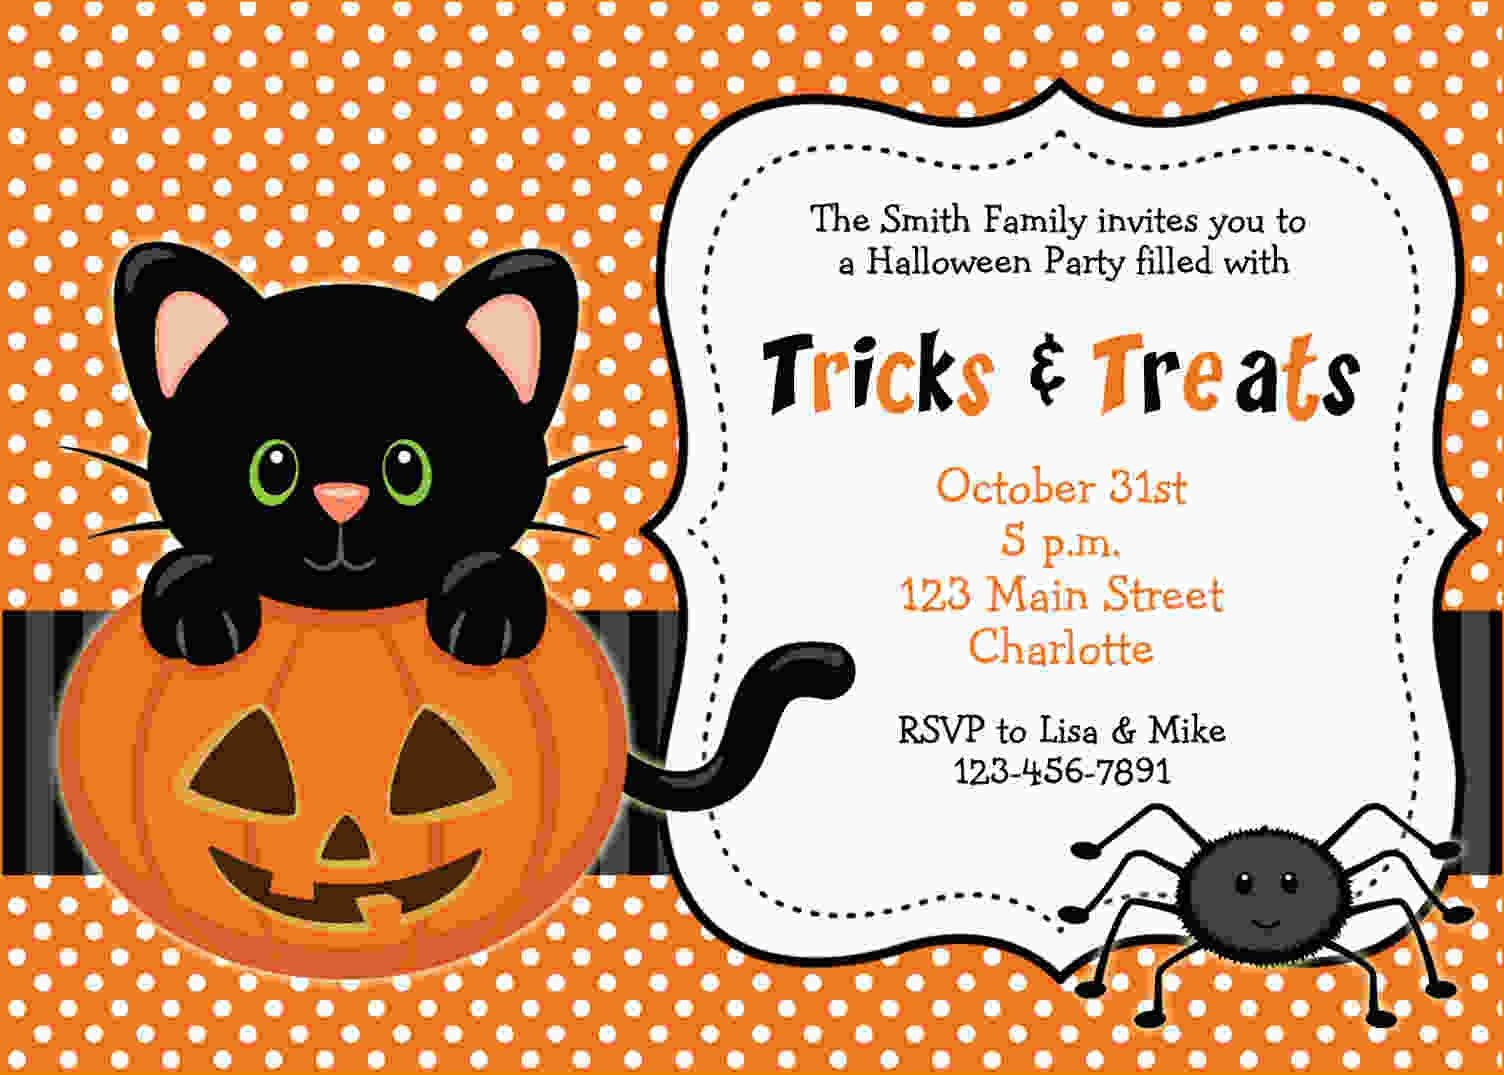 Free Printable Halloween Invitations   Free Printable Birthday - Free Halloween Birthday Invitation Templates Printable